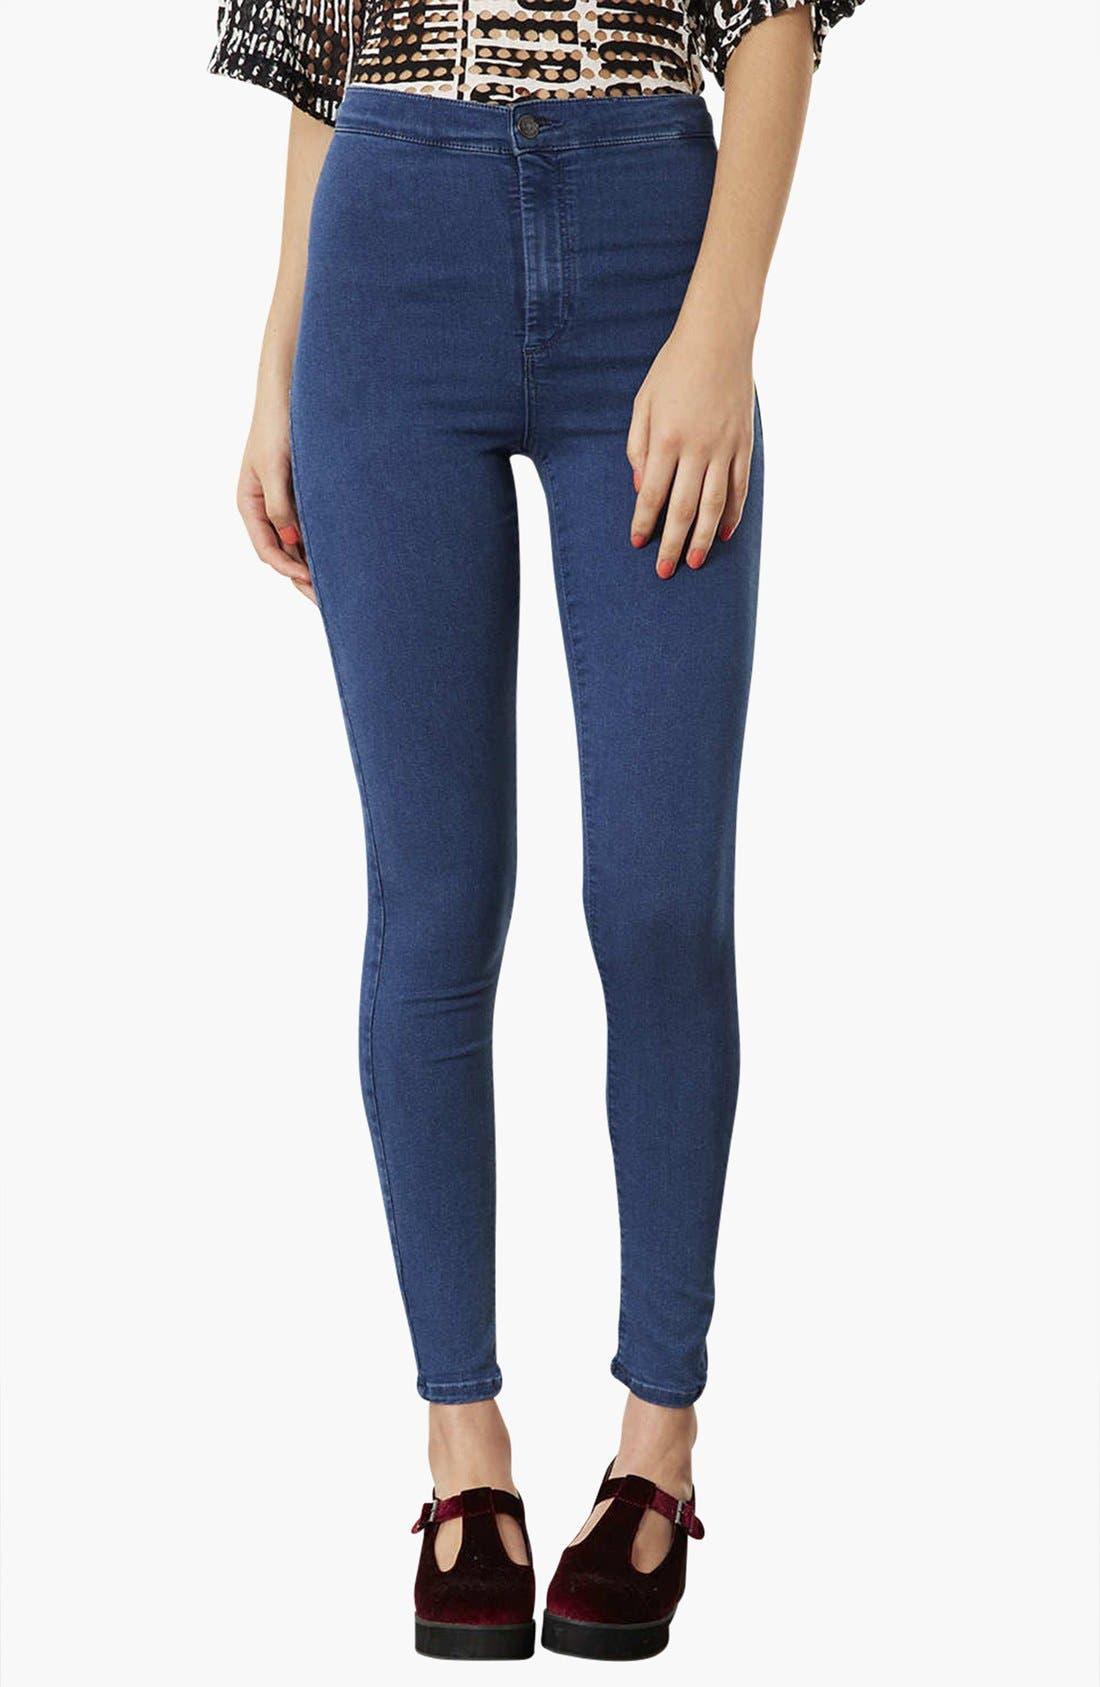 Main Image - Topshop Moto 'Joni' High Rise Skinny Jeans (Dark Stone) (Regular, Short & Long)